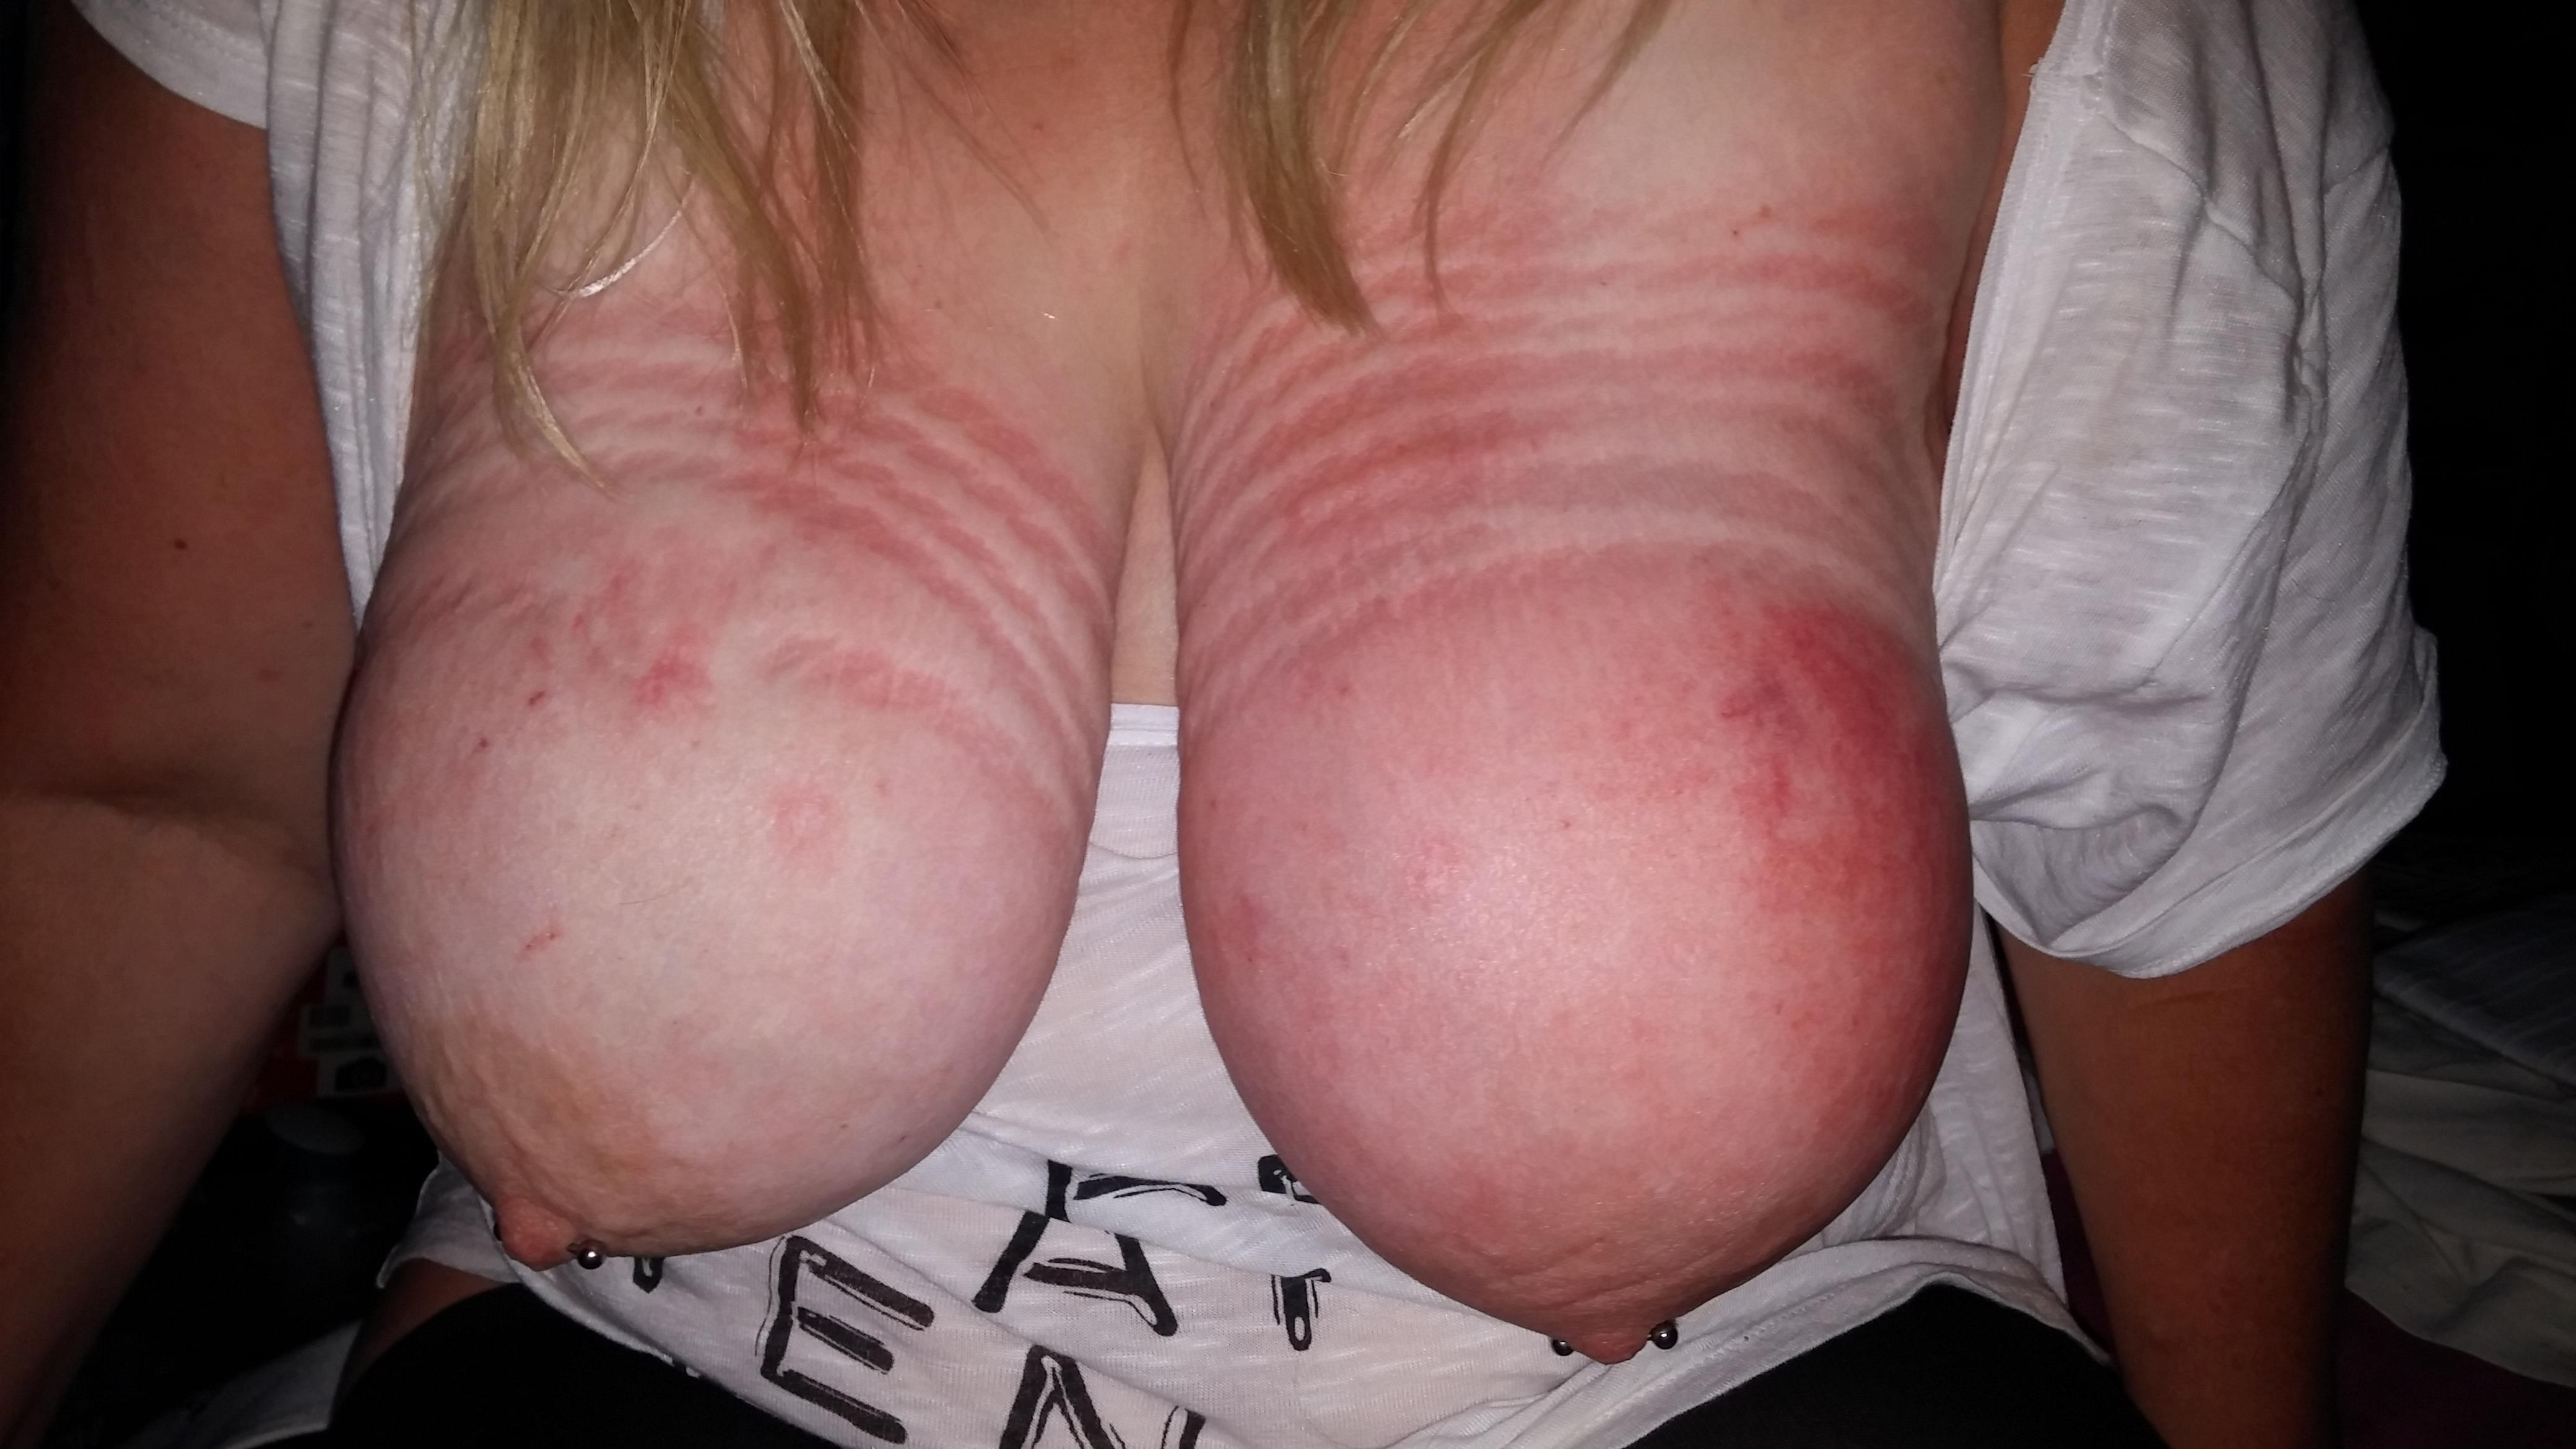 Dicke Titten Abgebunden